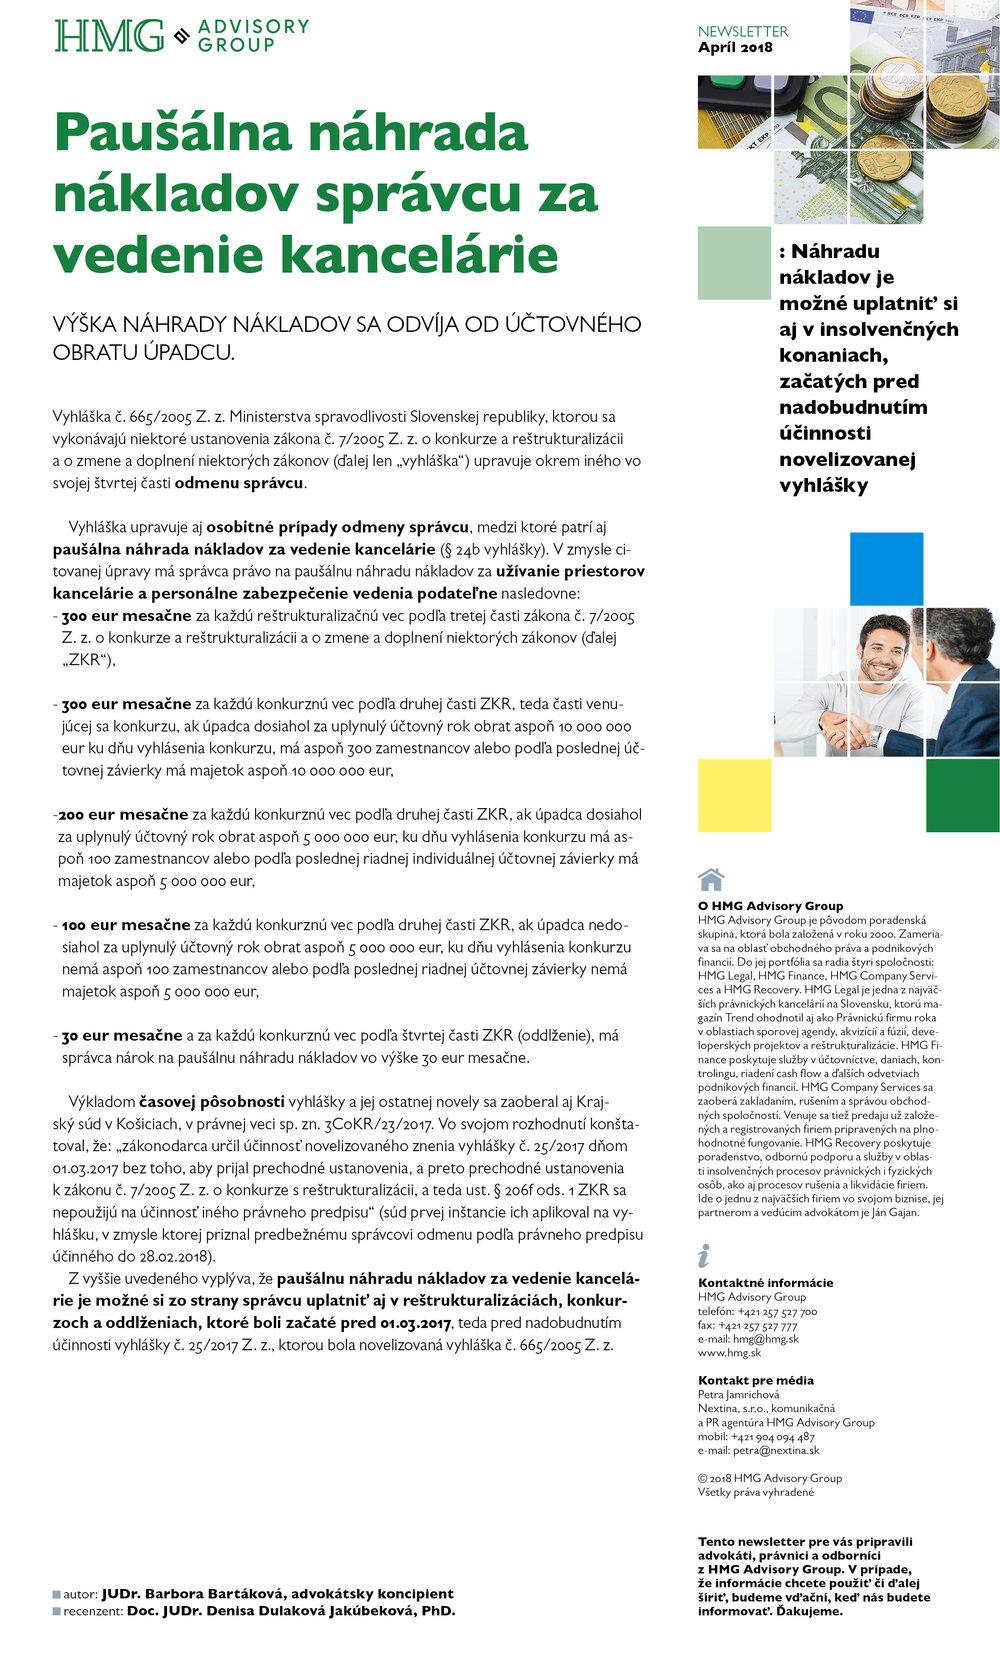 HMG_newsletter_pausalna nahrada.jpg